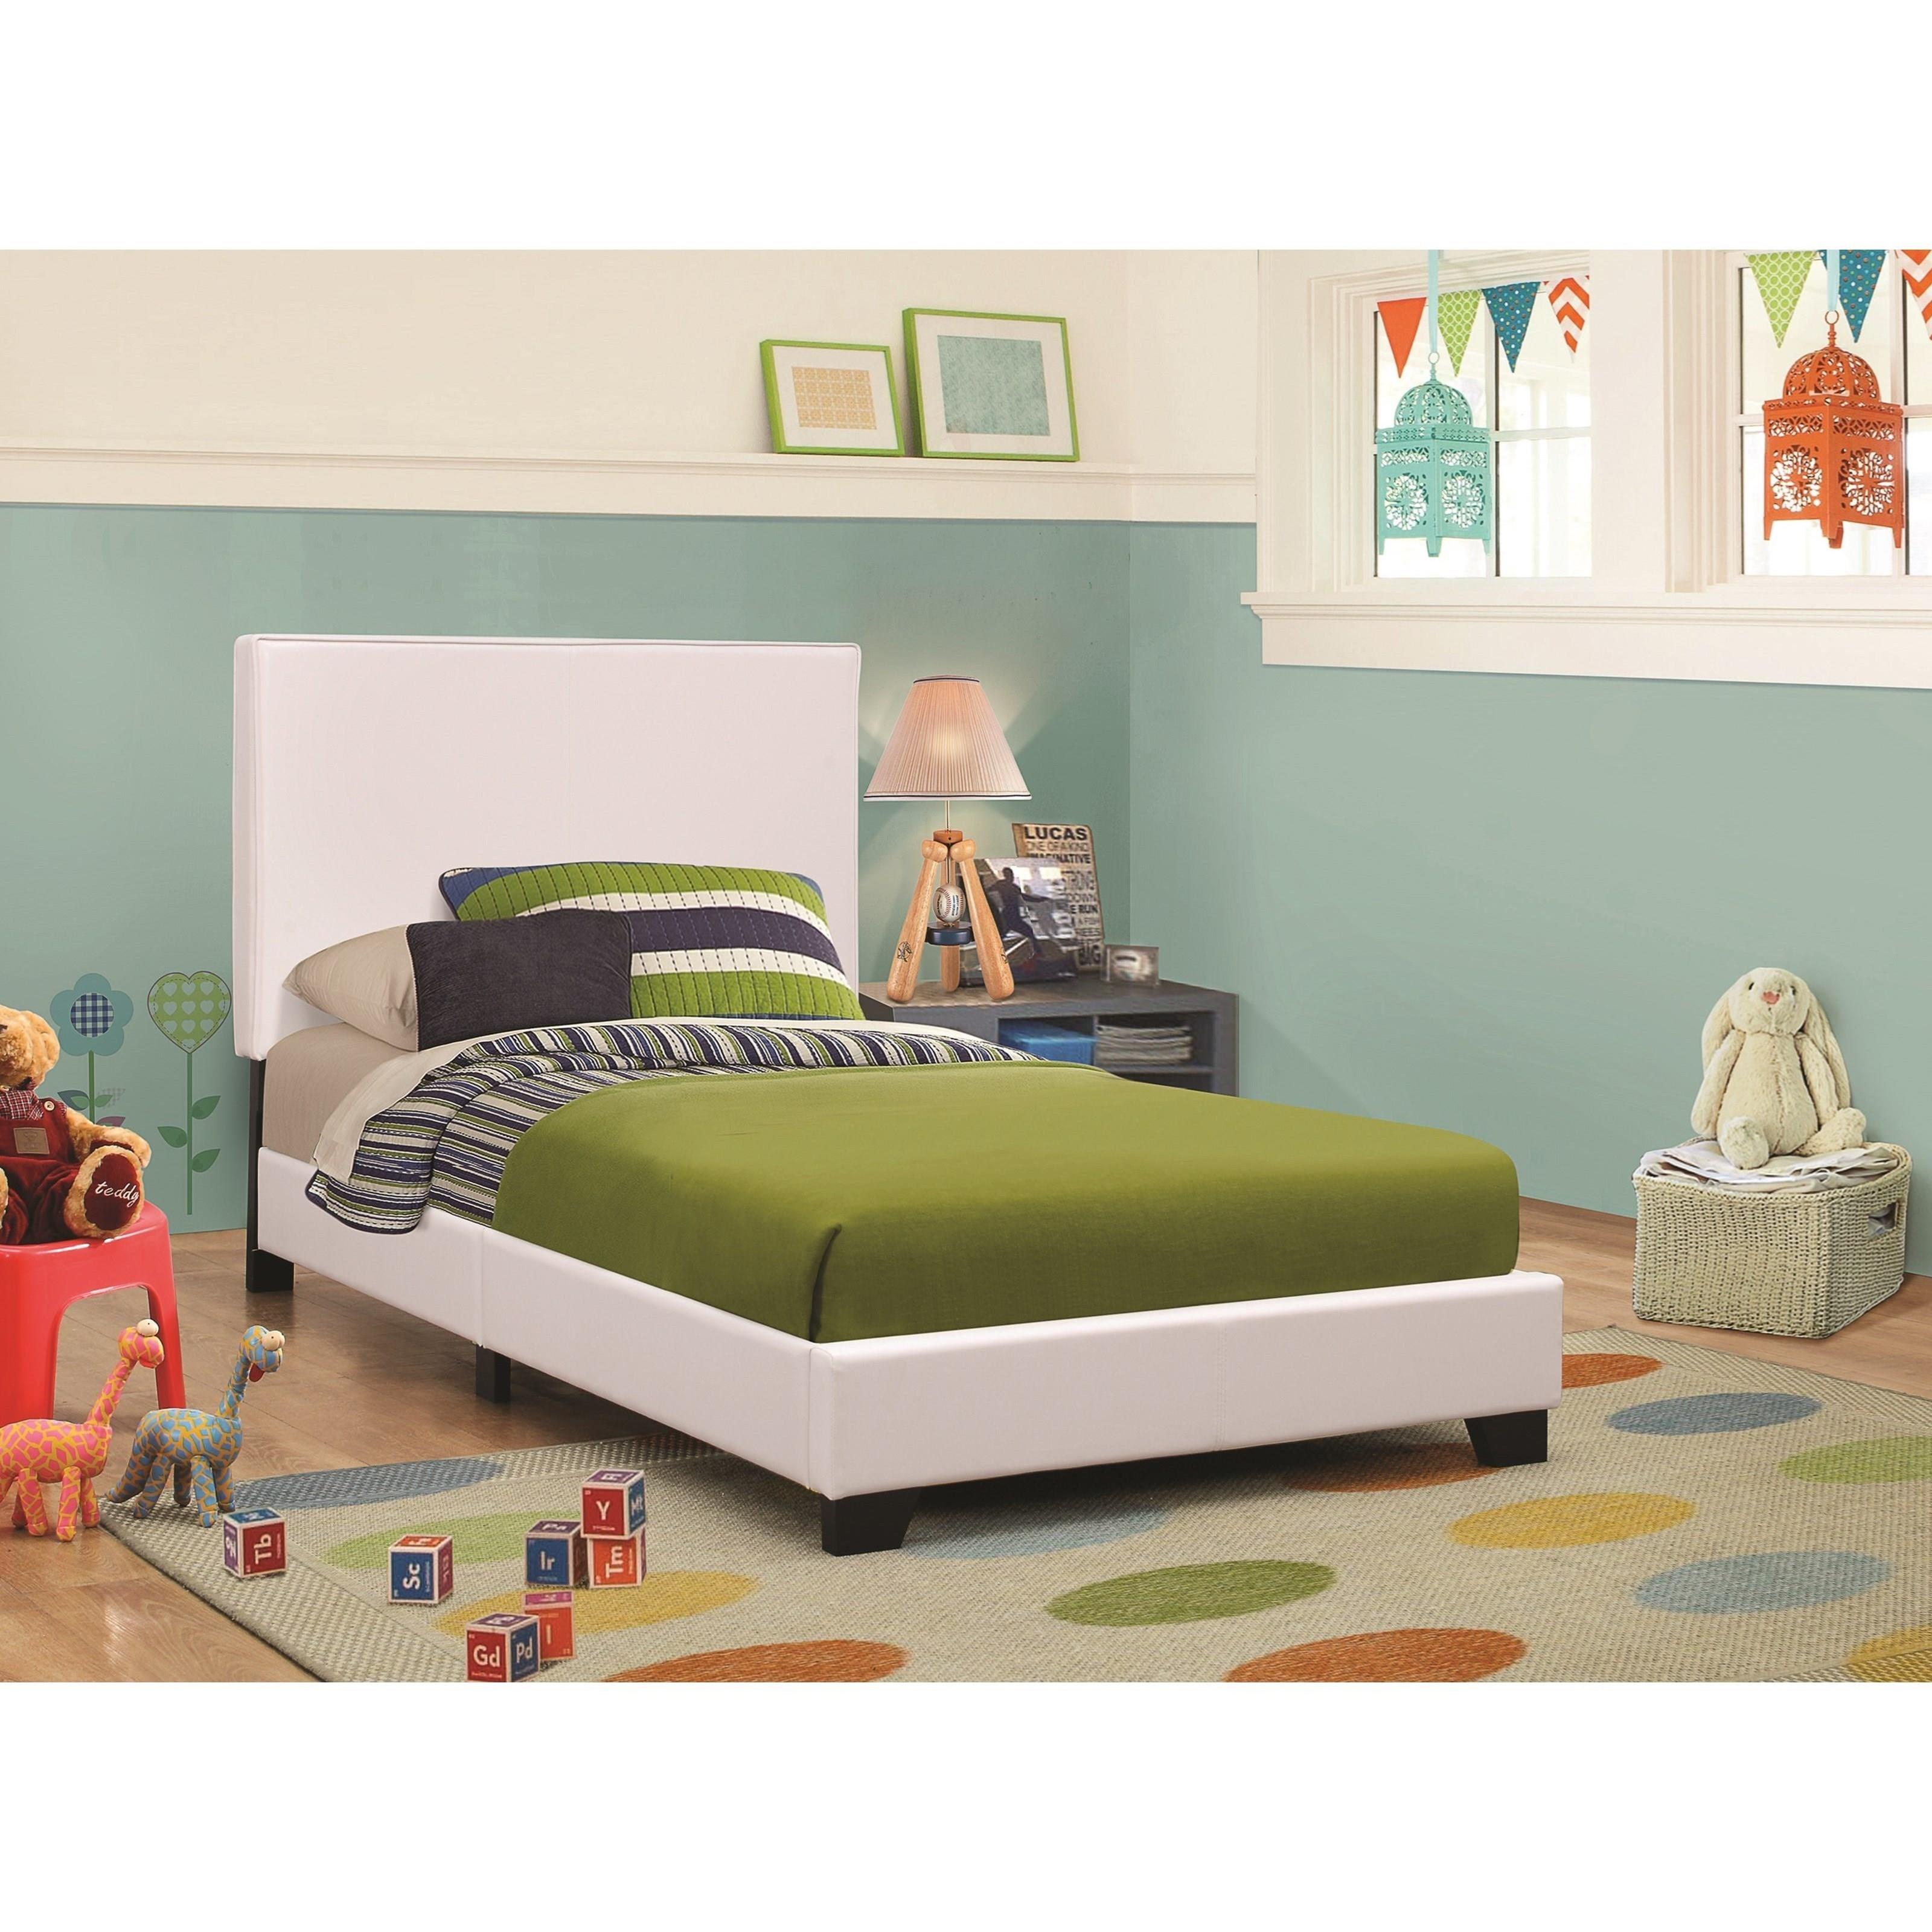 Coaster Upholstered Beds Upholstered Low Profile Twin Bed Prime Brothers Furniture Platform Beds Low Profile Beds